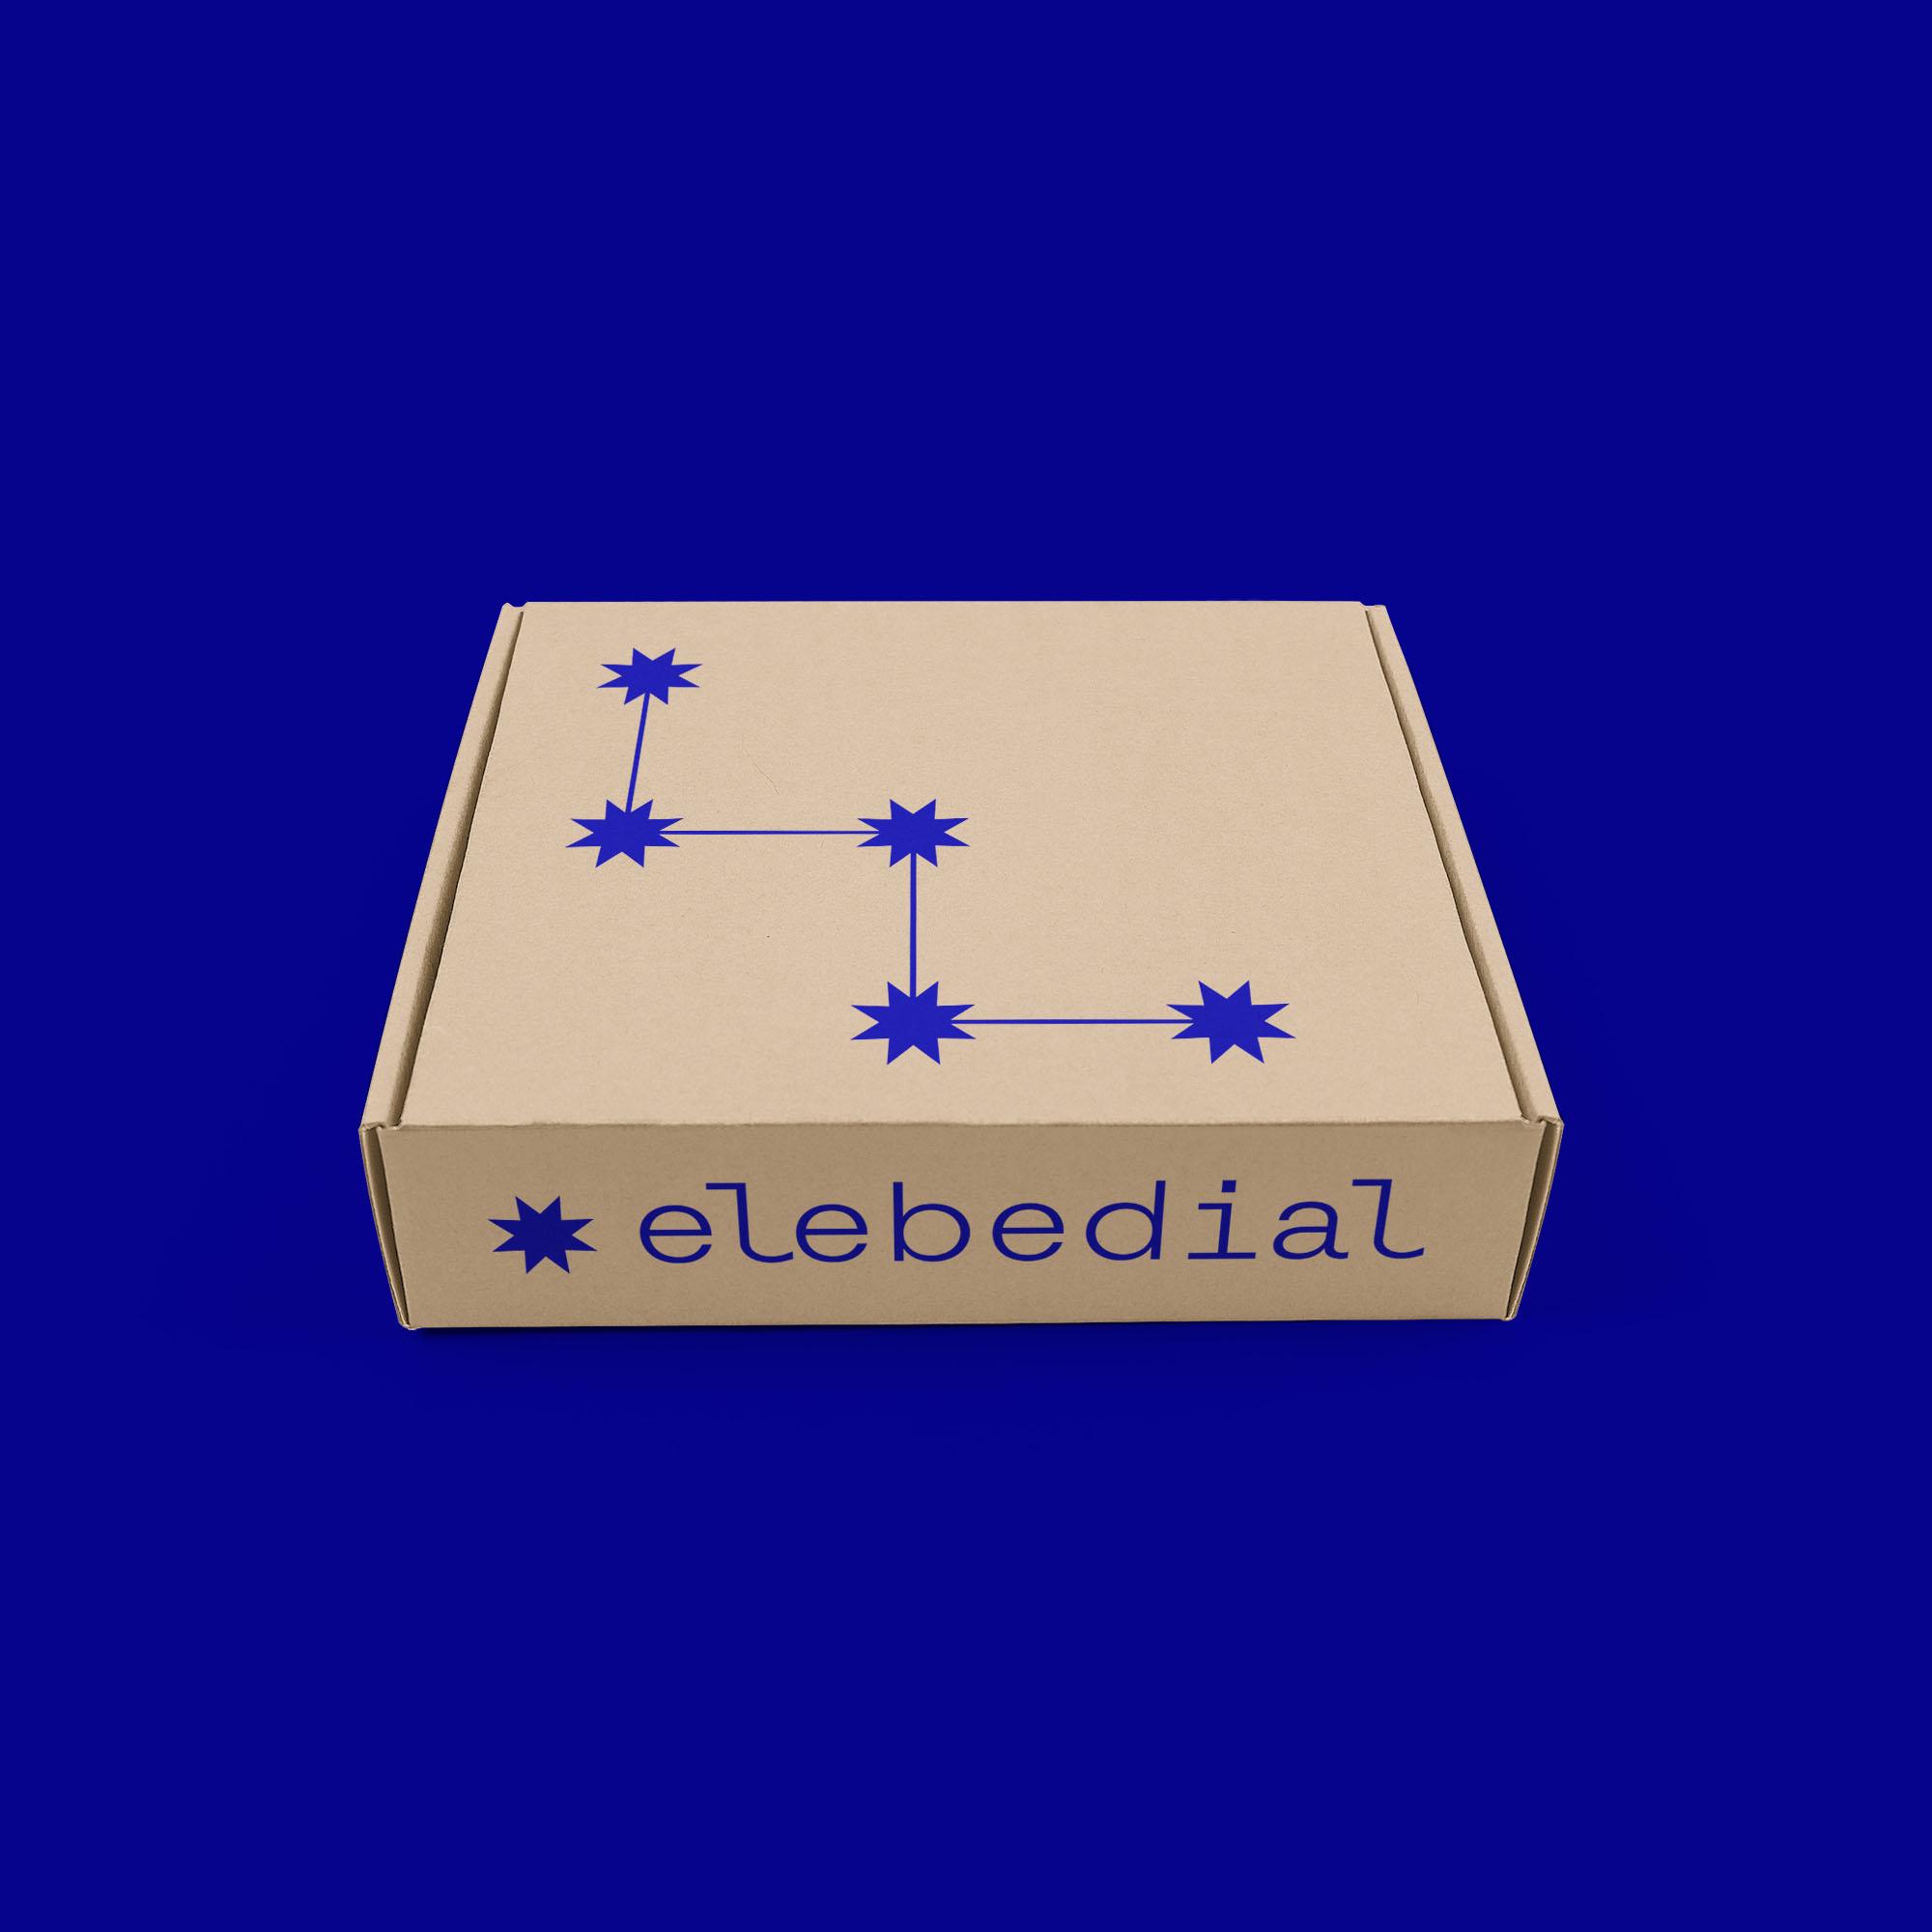 Elebedial_krabice_02